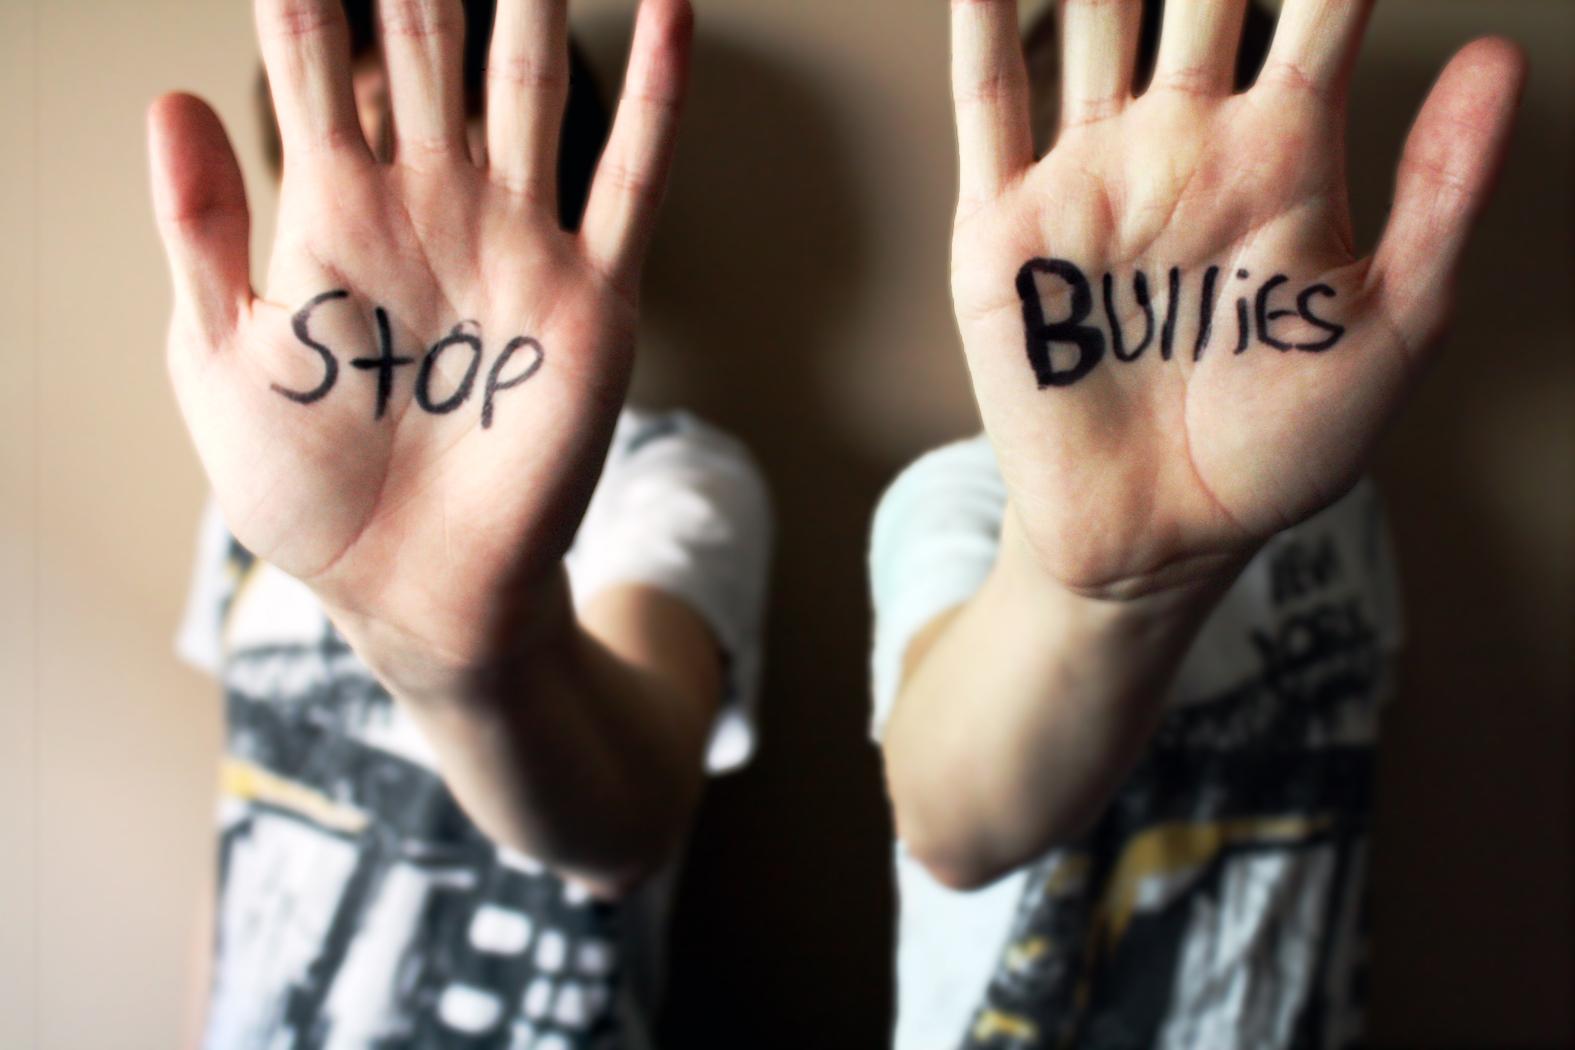 stop bullies